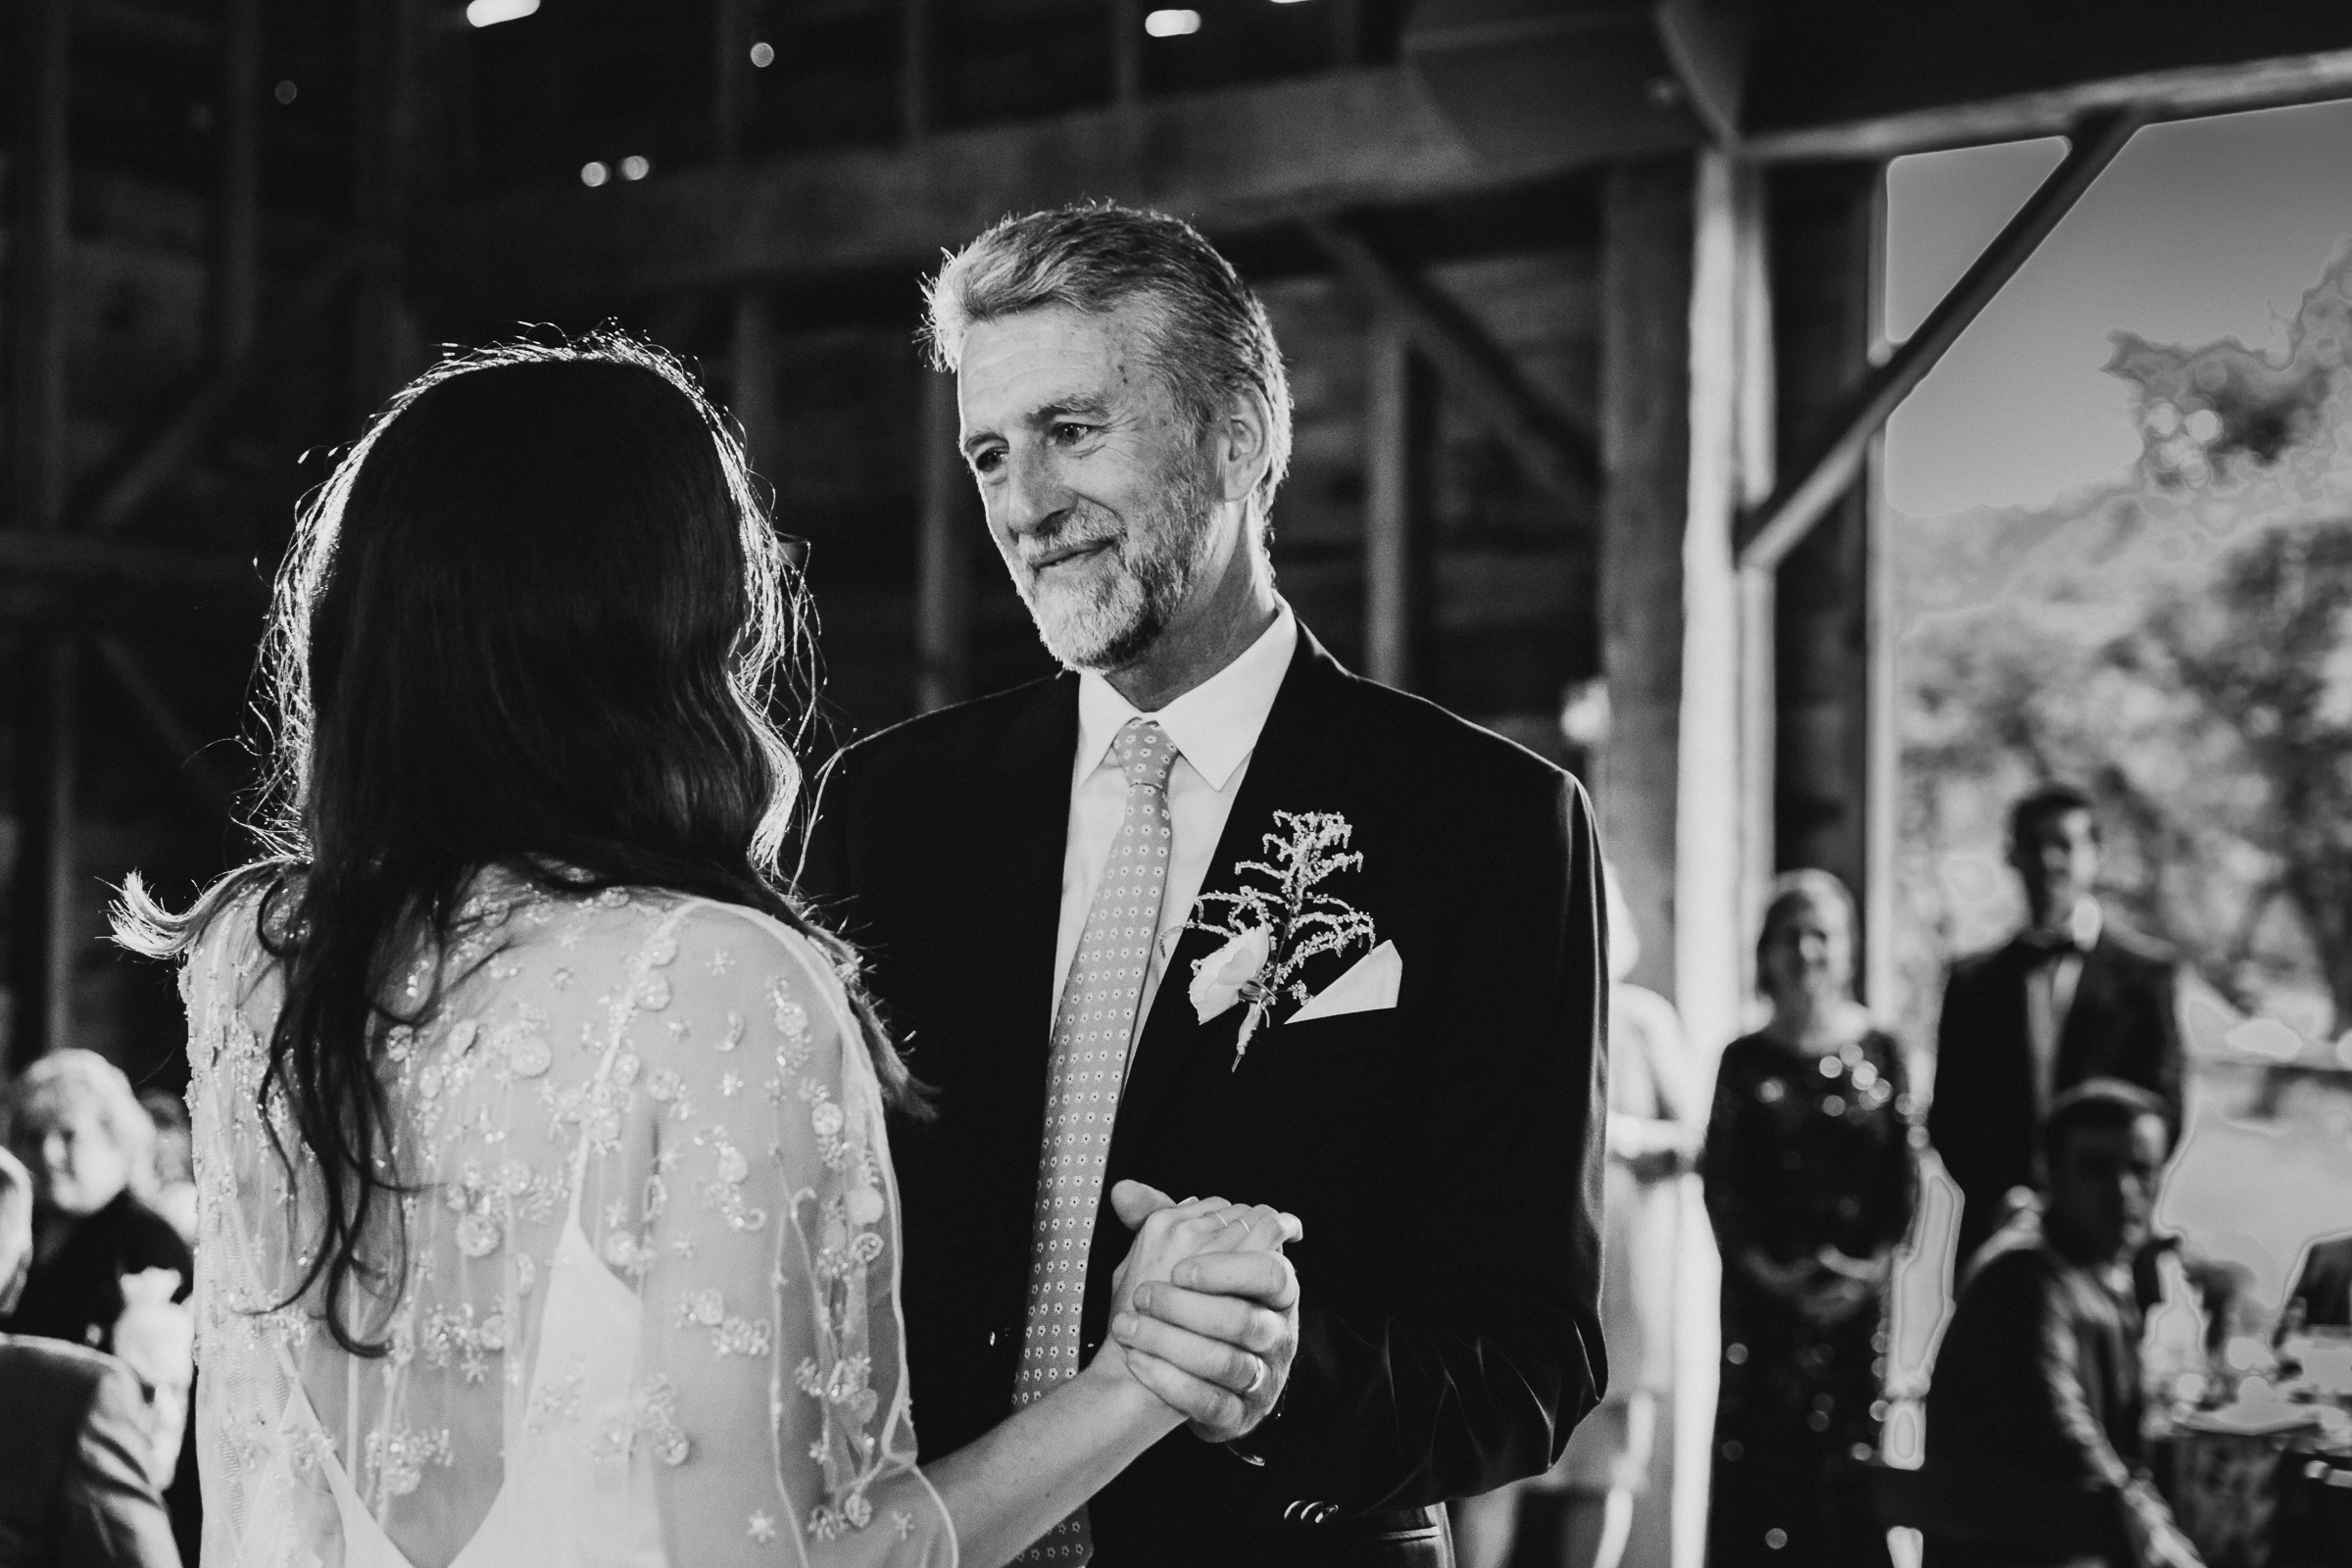 Handsome-Hollow-Long-Eddy-Catskills-New-York-Fine-Art-Documentary-Wedding-Photographer-104.jpg